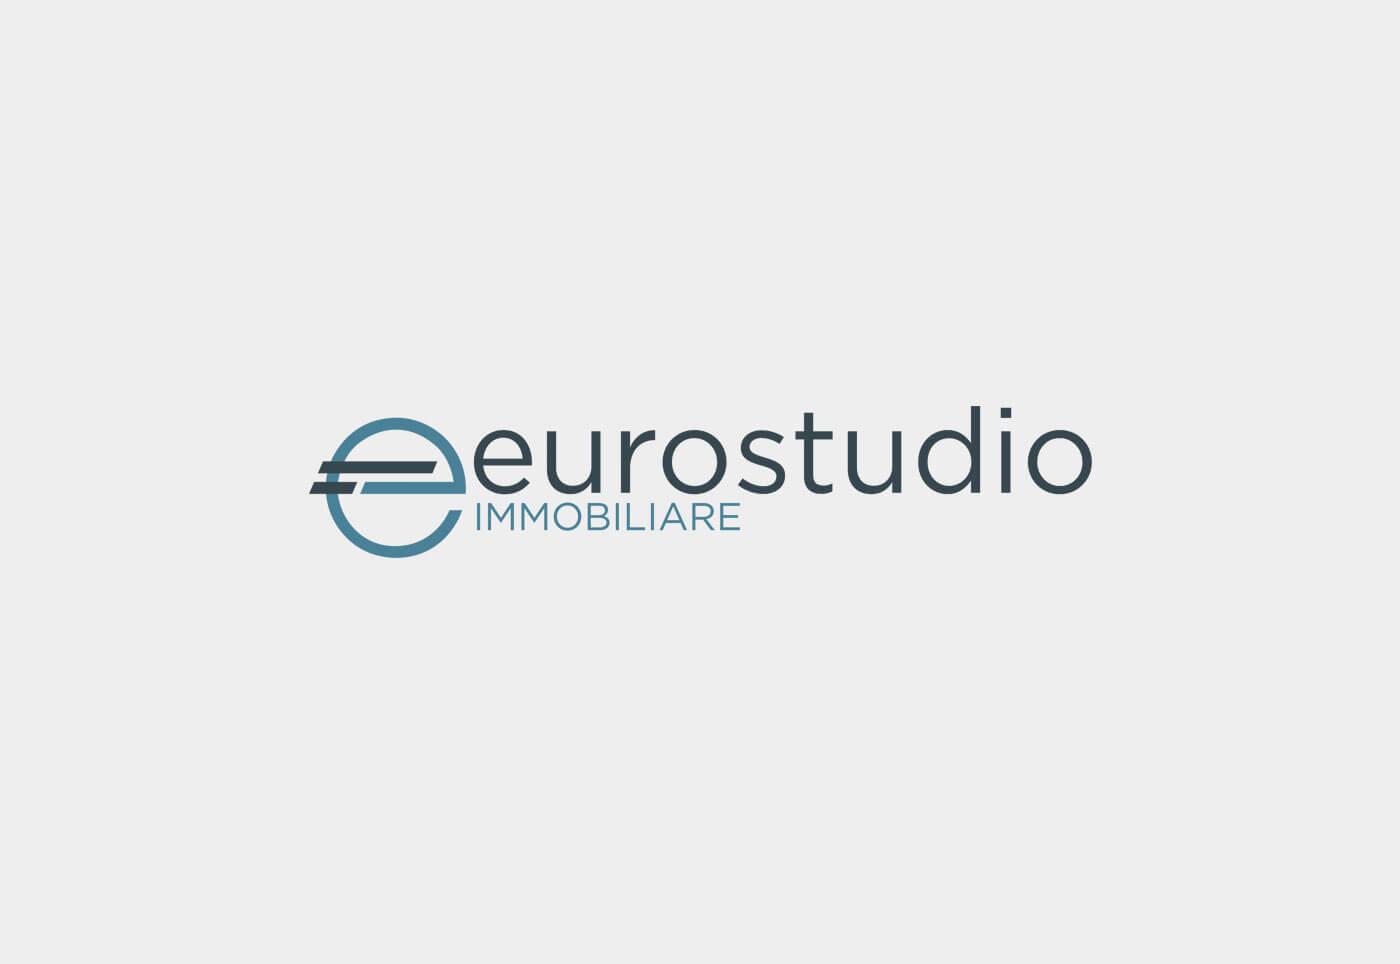 logo eurostudio immobiliare